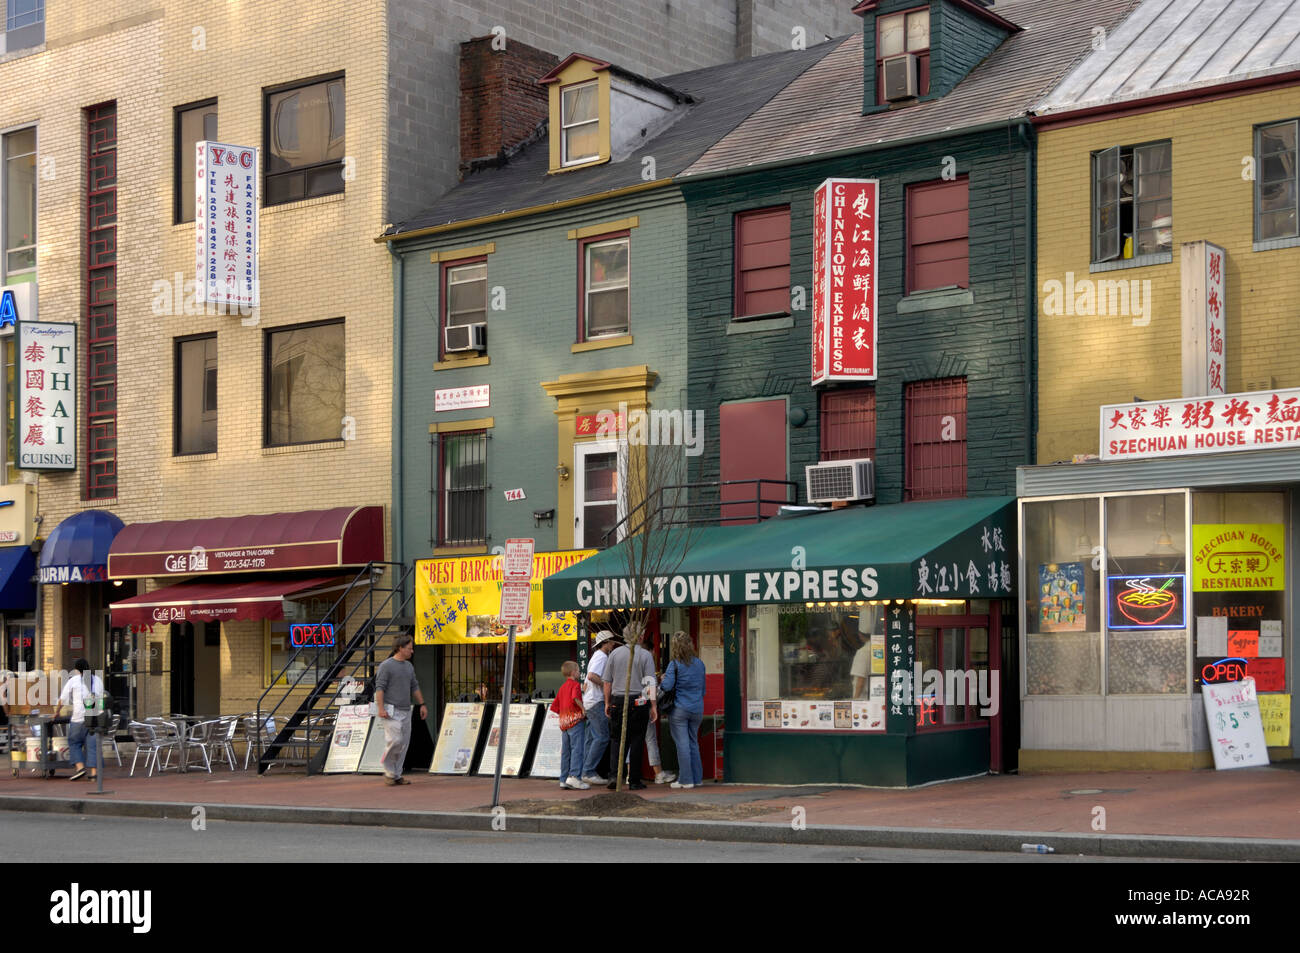 Chinatown Shops And Restaurants Washington Dc Usa Stock